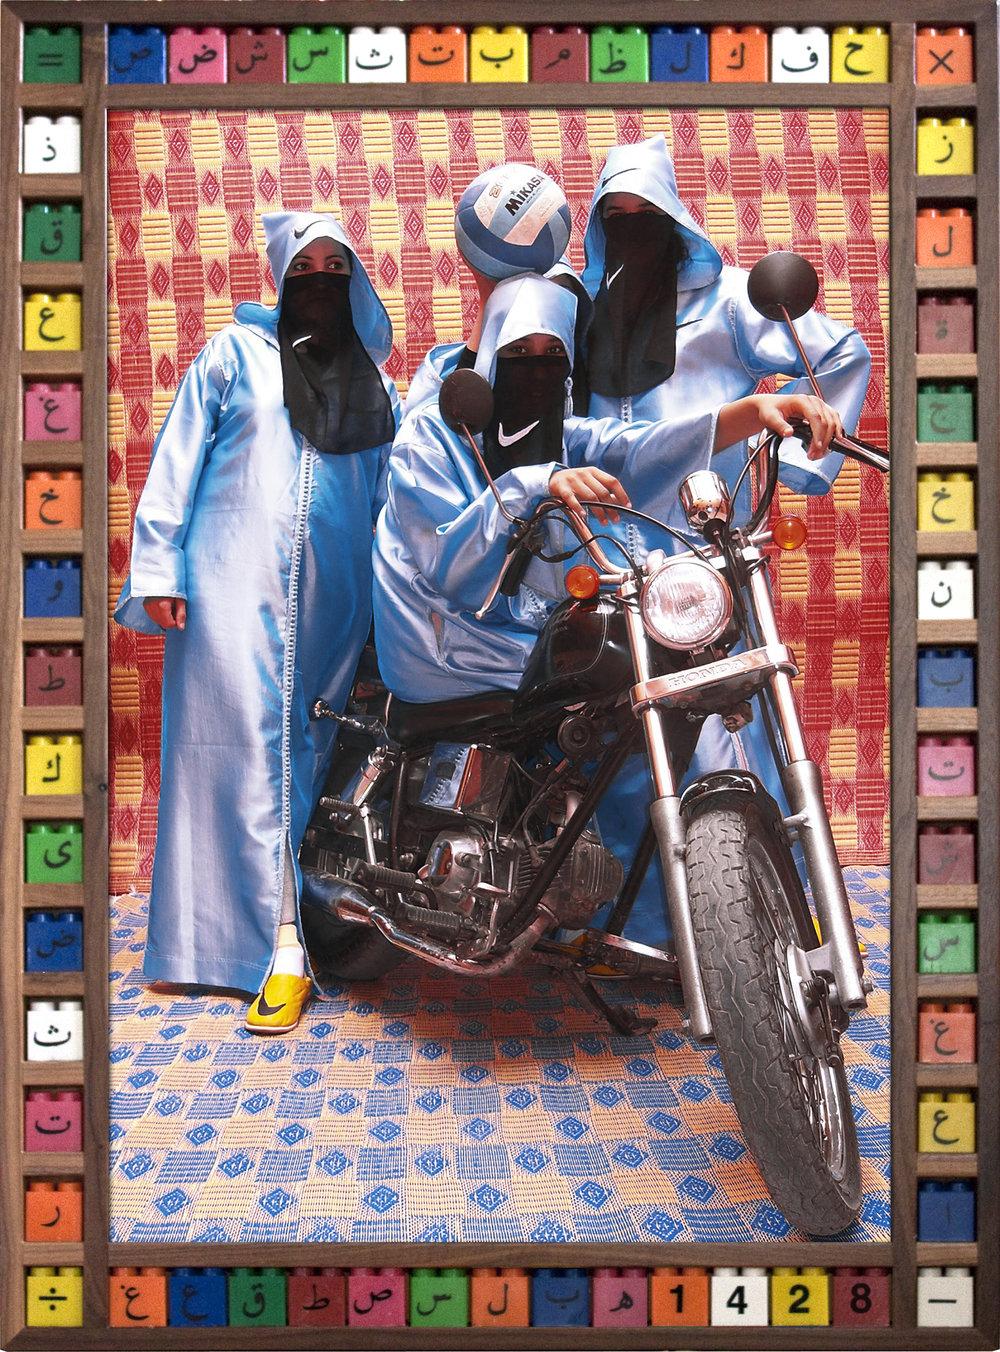 'Nikee Rider' ©Hassan Hajjaj